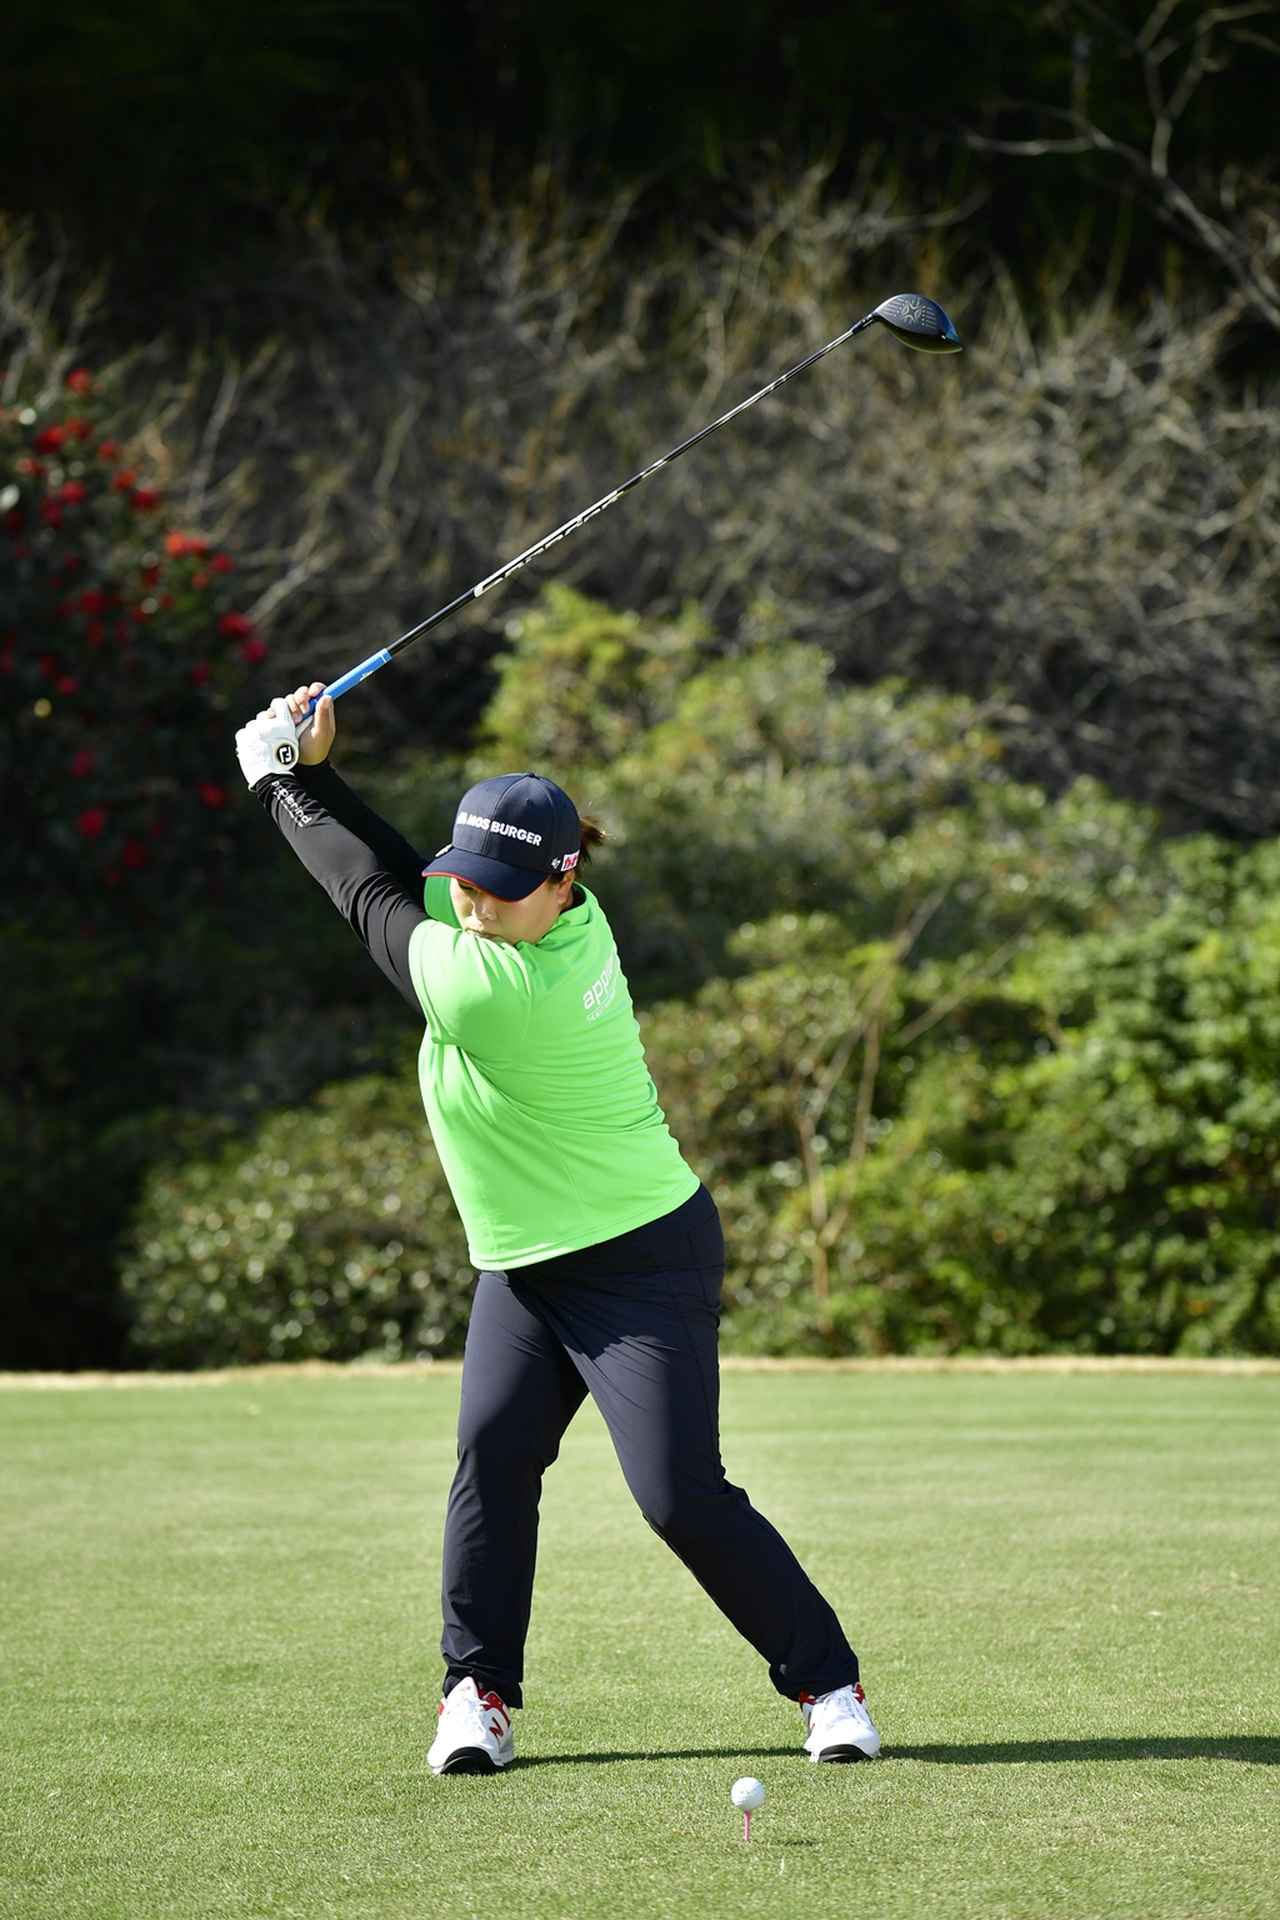 Images : 7番目の画像 - アン・ソンジュのドライバー連続写真 - みんなのゴルフダイジェスト